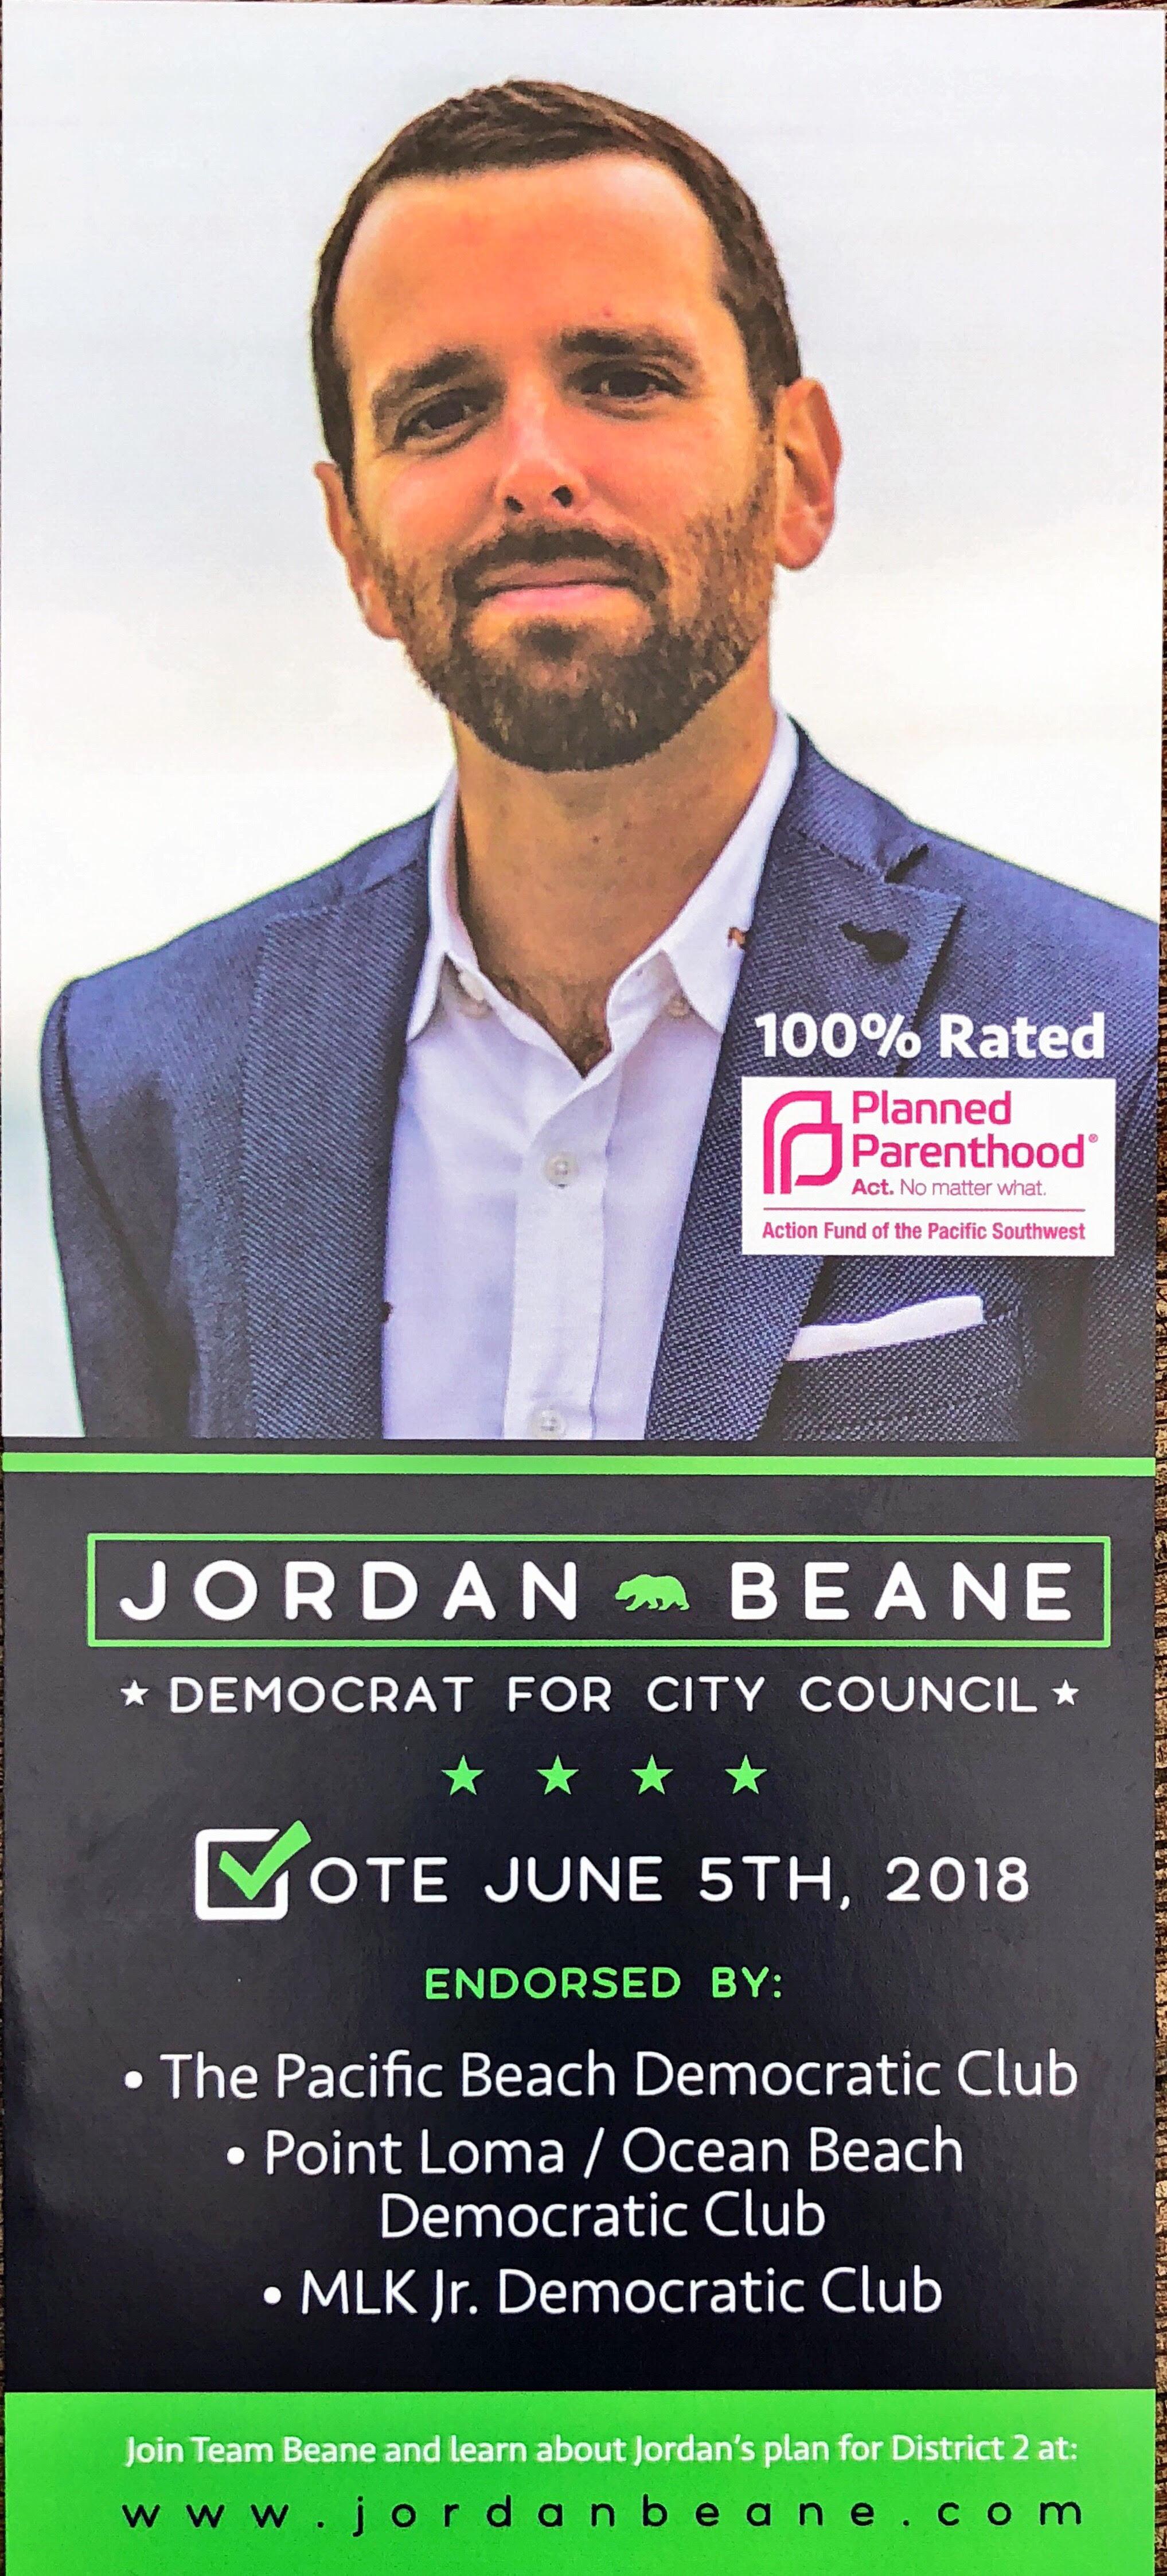 Jordan Beane